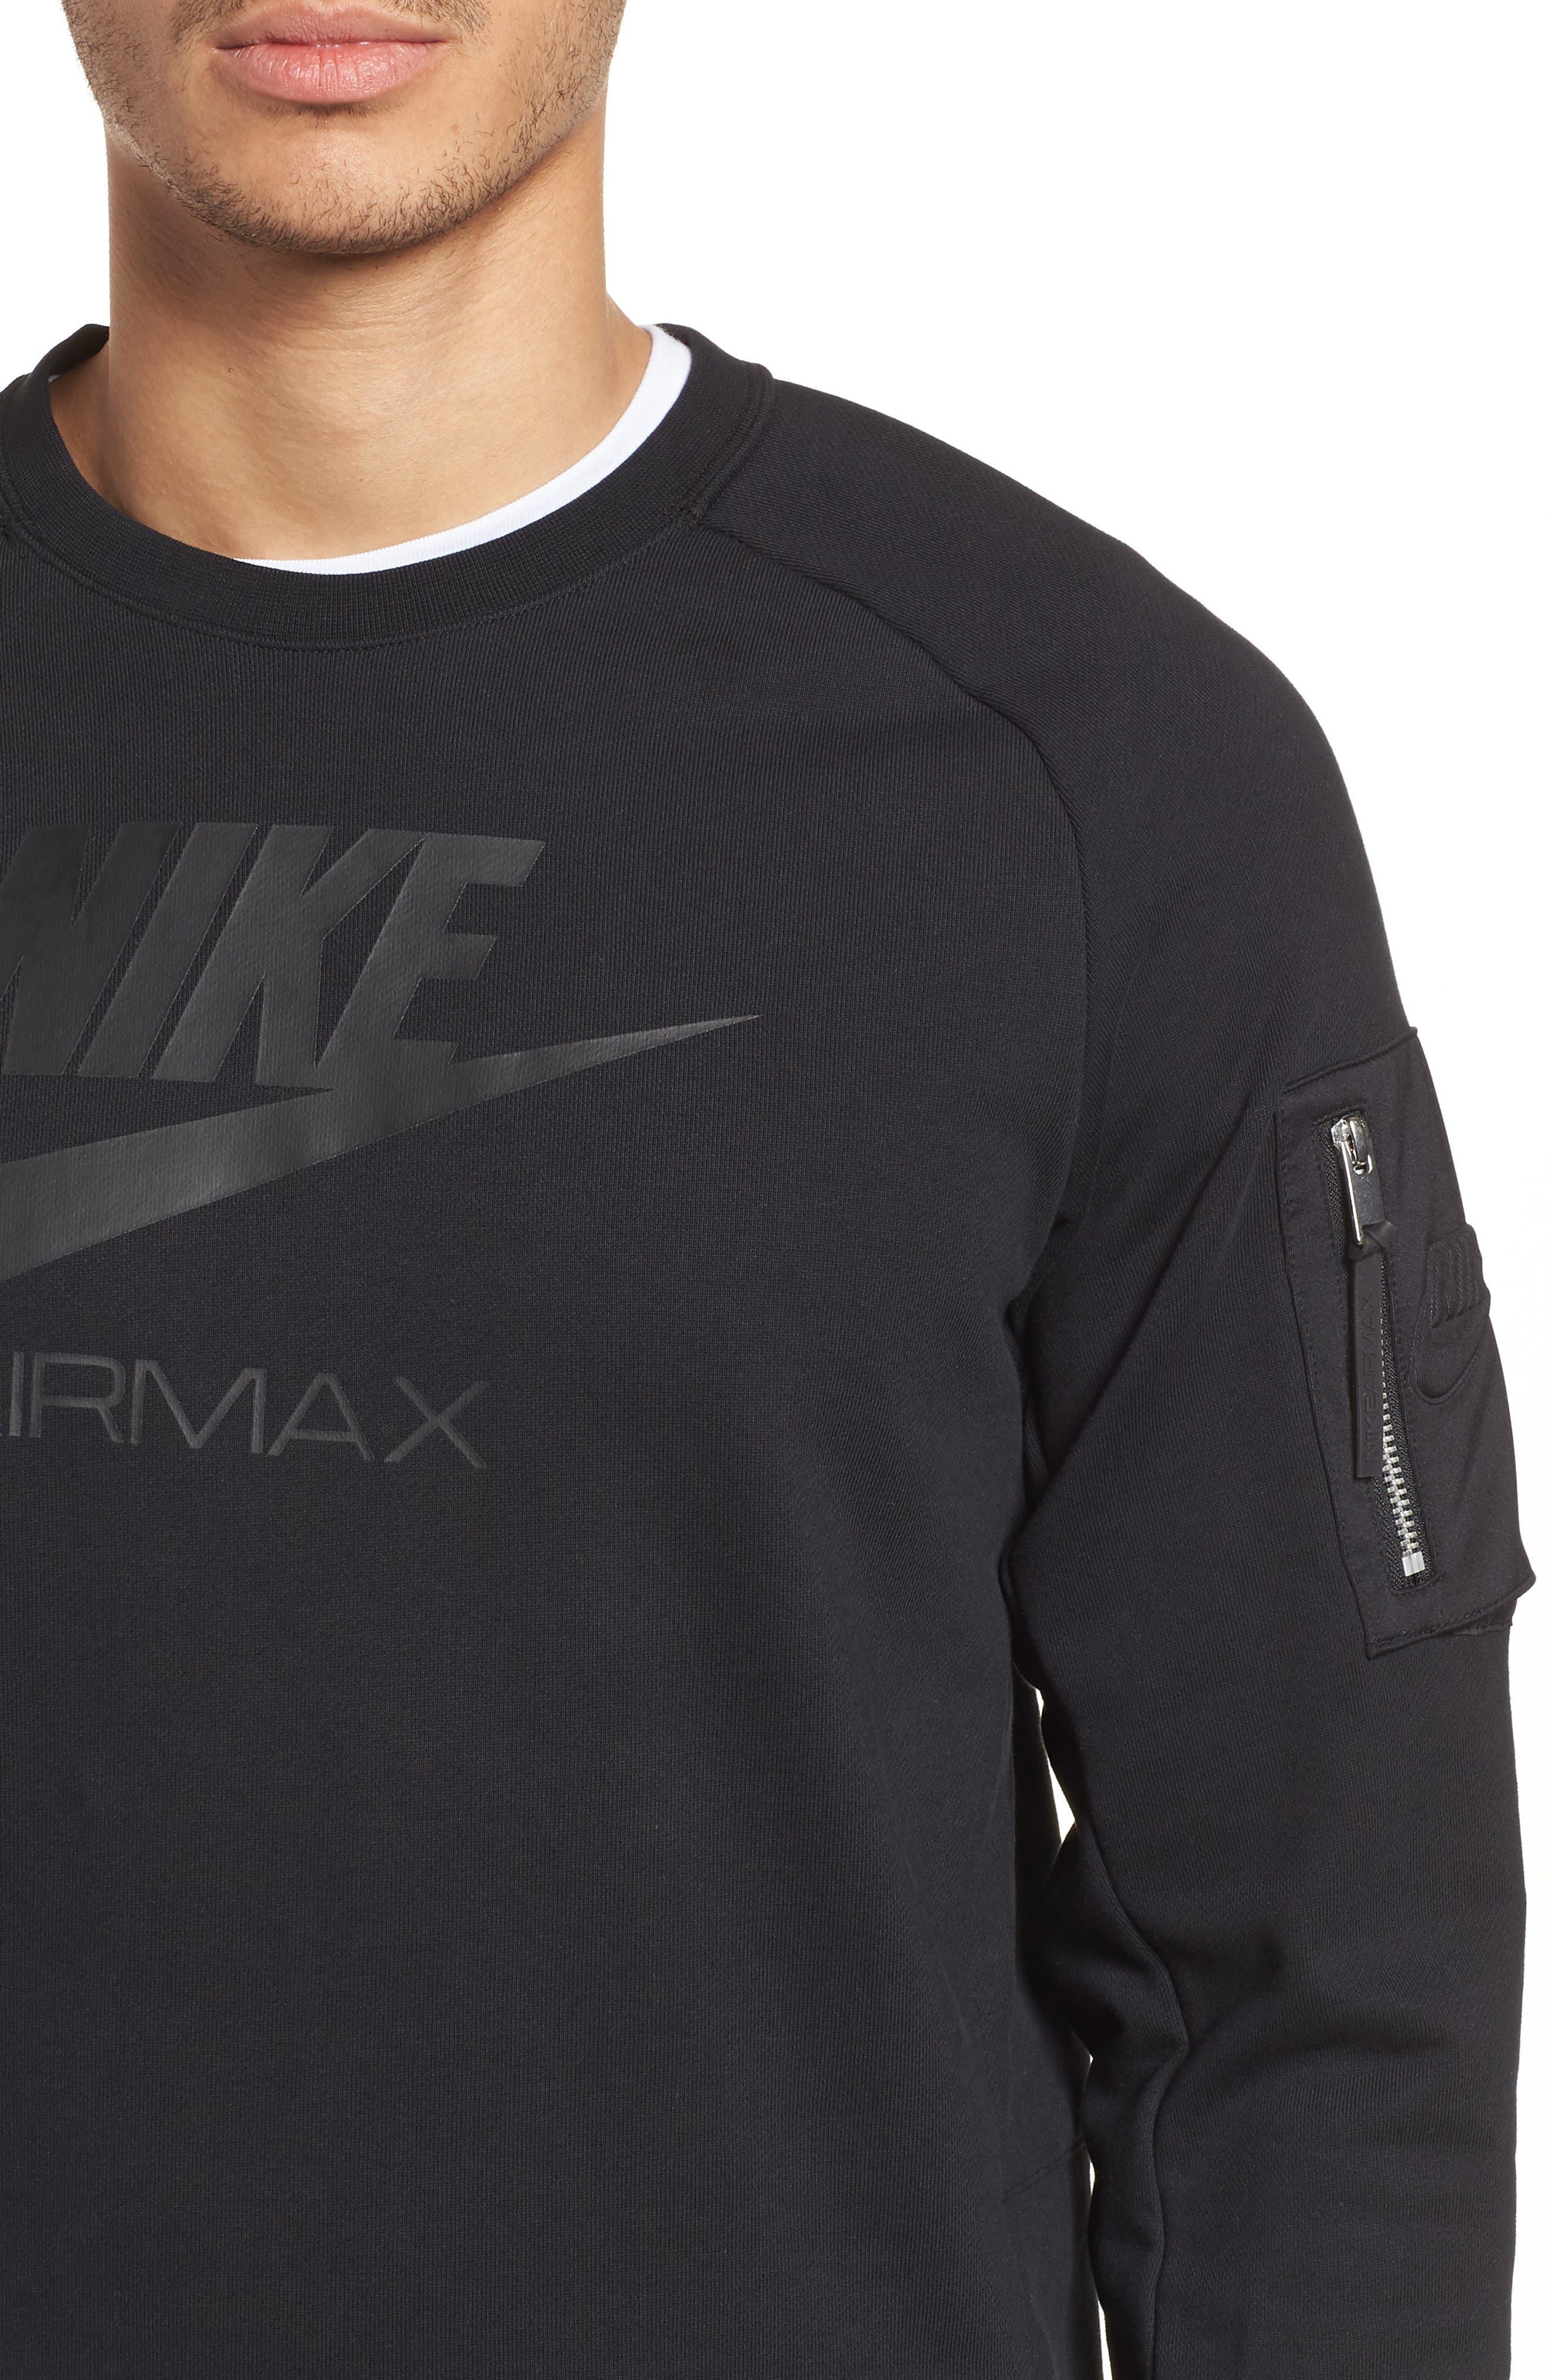 NSW Air Max Crewneck Sweatshirt,                             Alternate thumbnail 4, color,                             BLACK/ BLACK/ BLACK